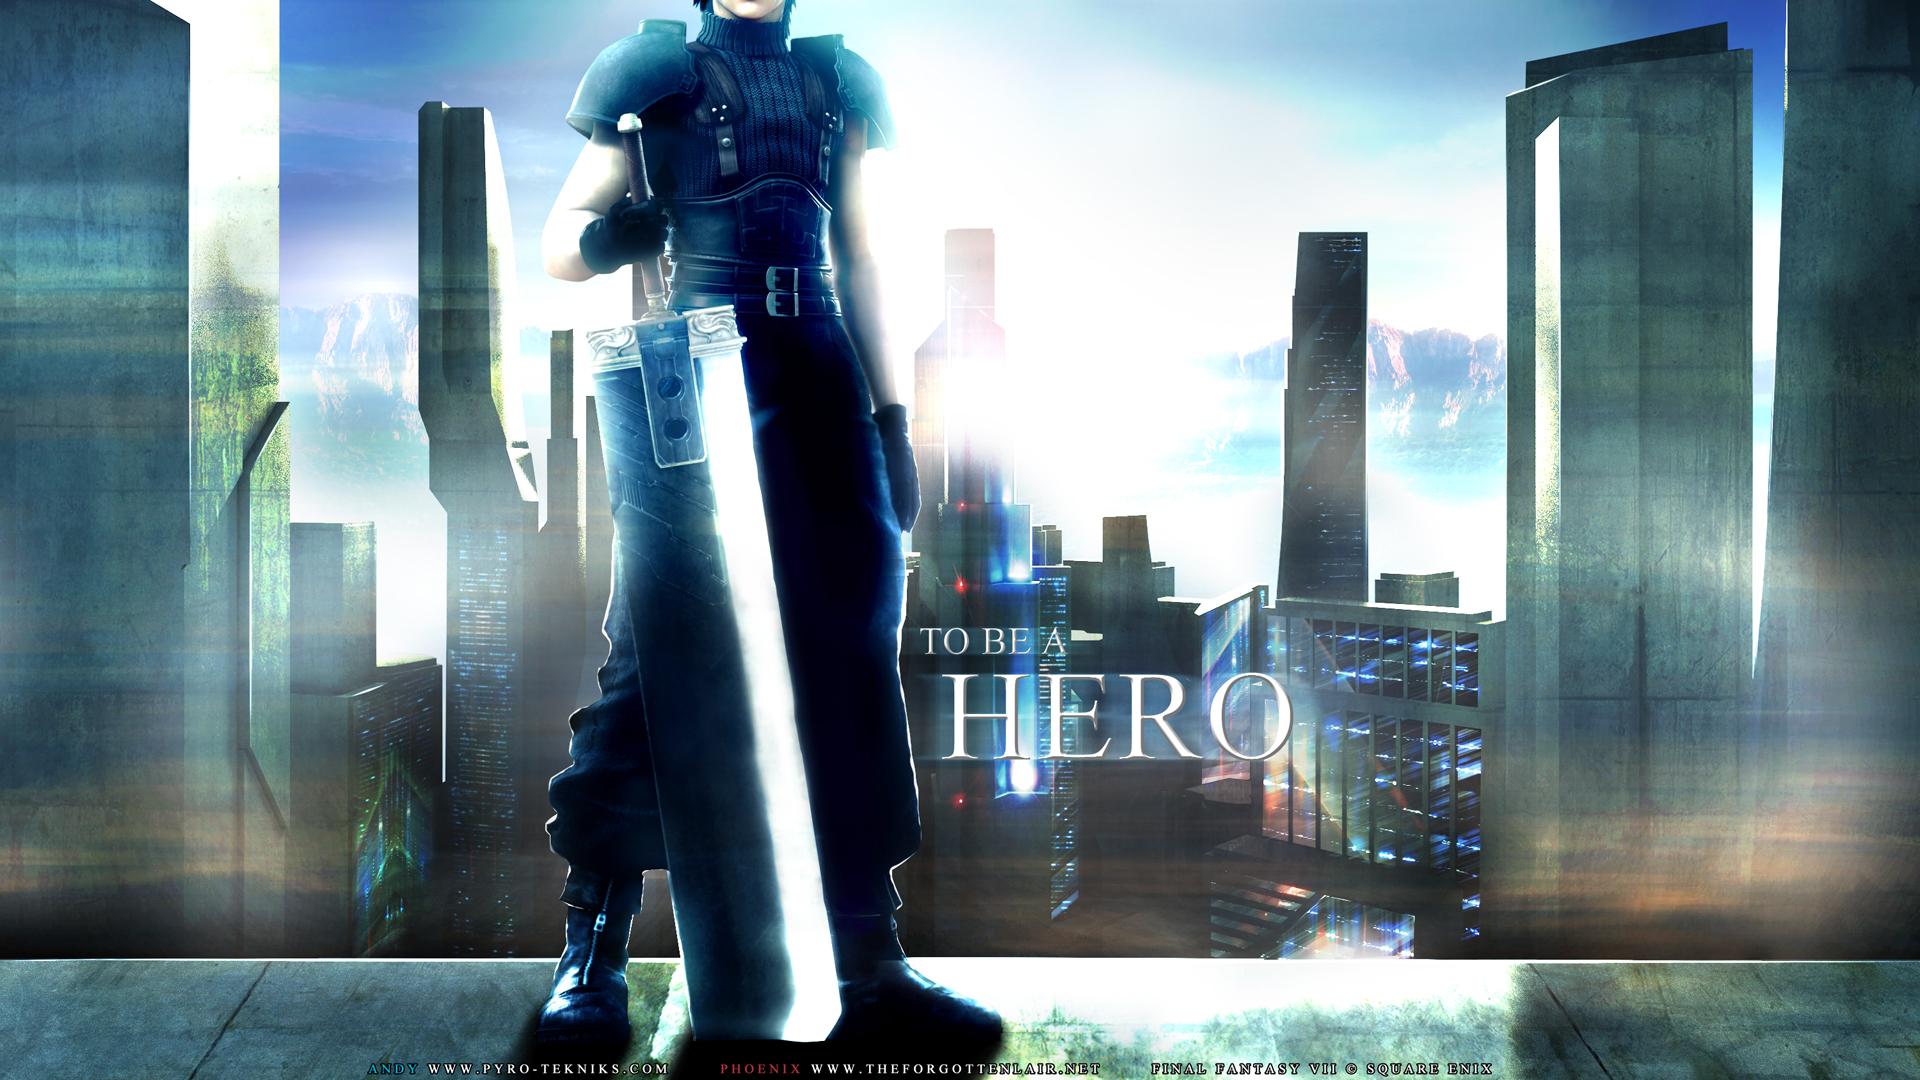 Final fantasy vii crisis core wallpaper hero minitokyo - Zack fair crisis core wallpaper ...